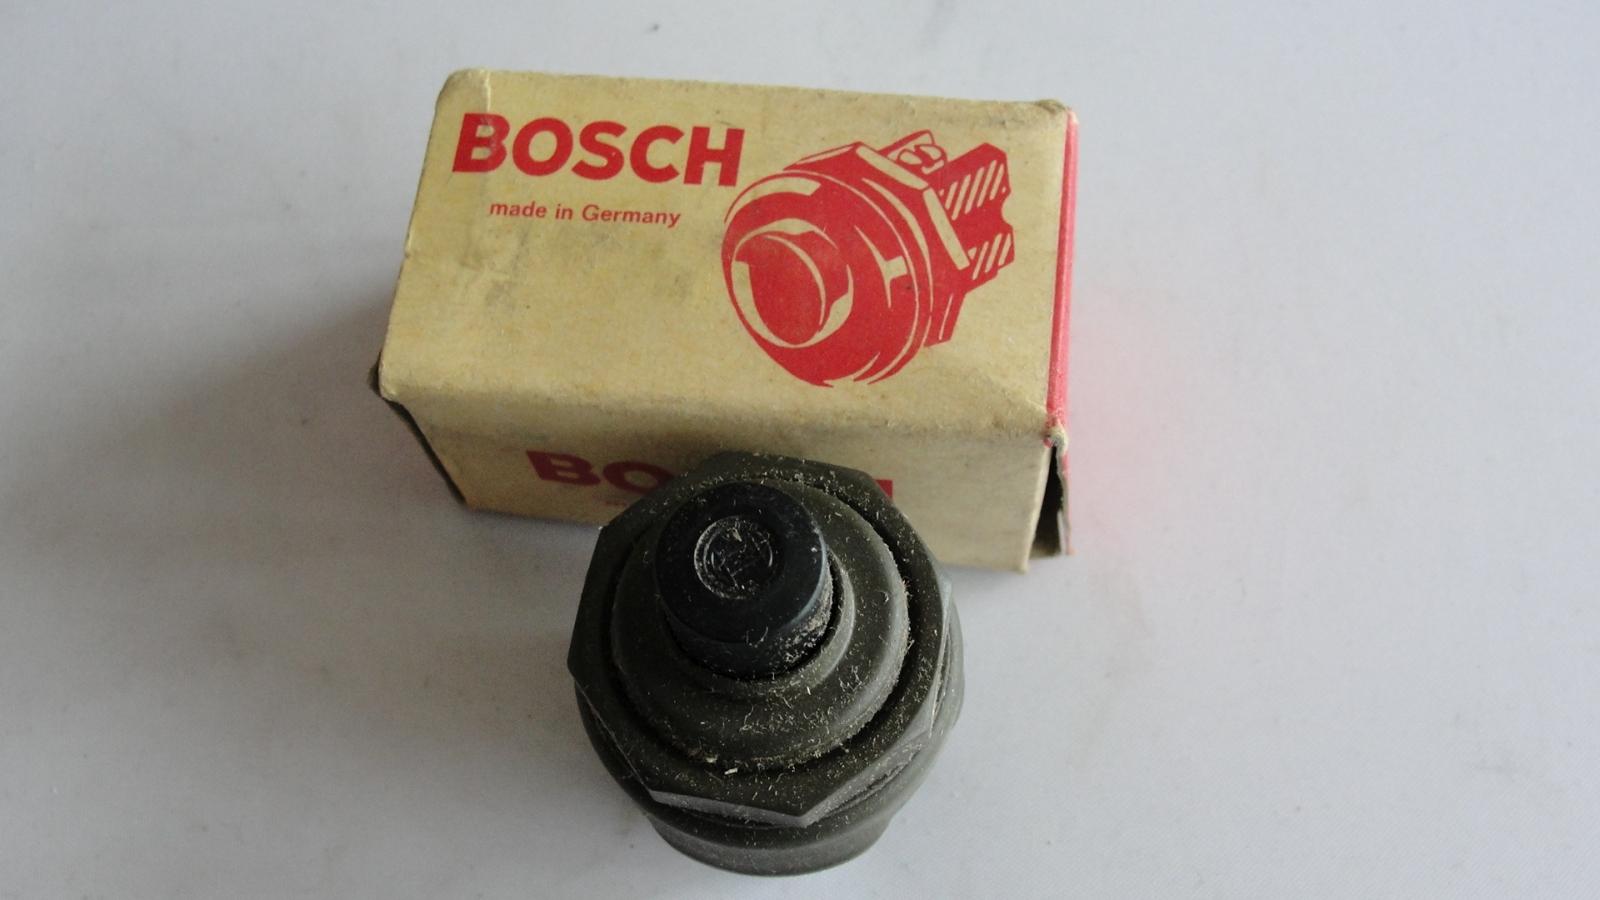 Bosch Schalter mit Widerstand 0340301010 SH/RZ/12  switch conmutador interrupteu